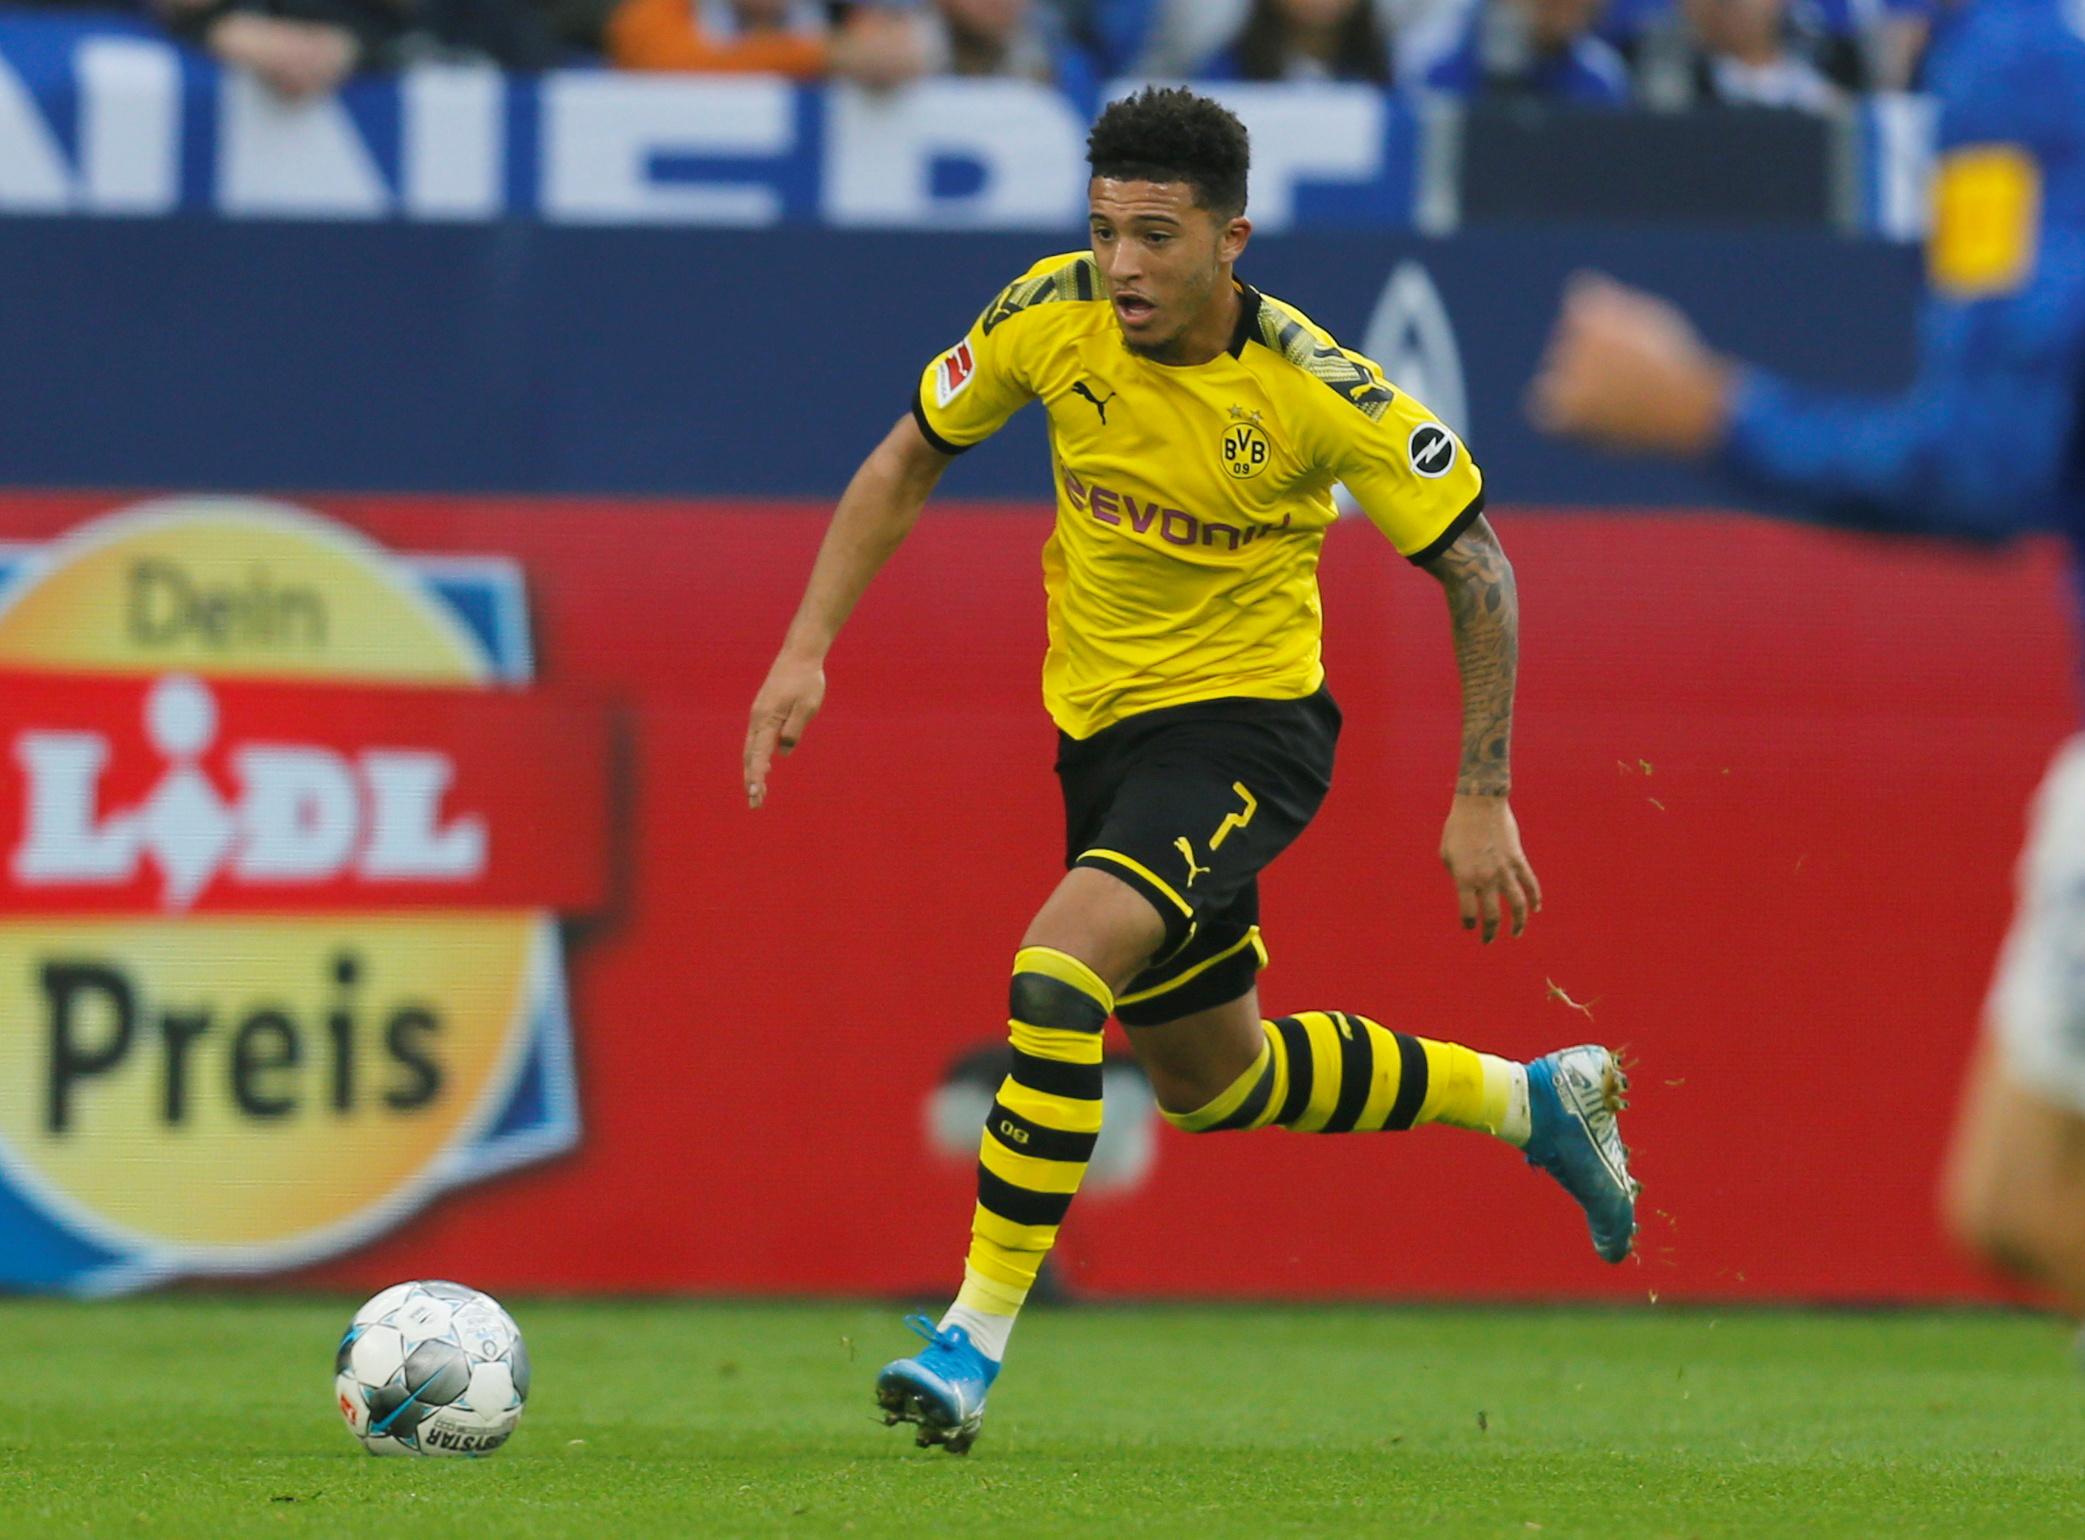 Football - Etranger - Bundesliga : Borussia Dortmund-Eintracht Francfort en direct